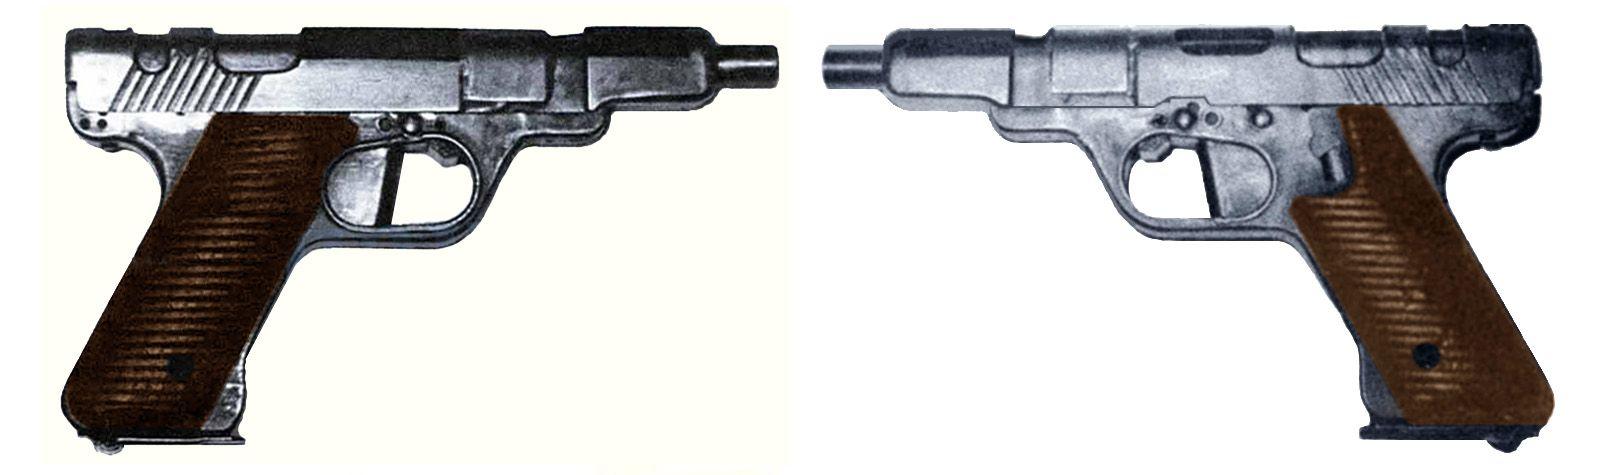 Arme Prototype gustloff werk volkspistole - germany - under development 1944-1945